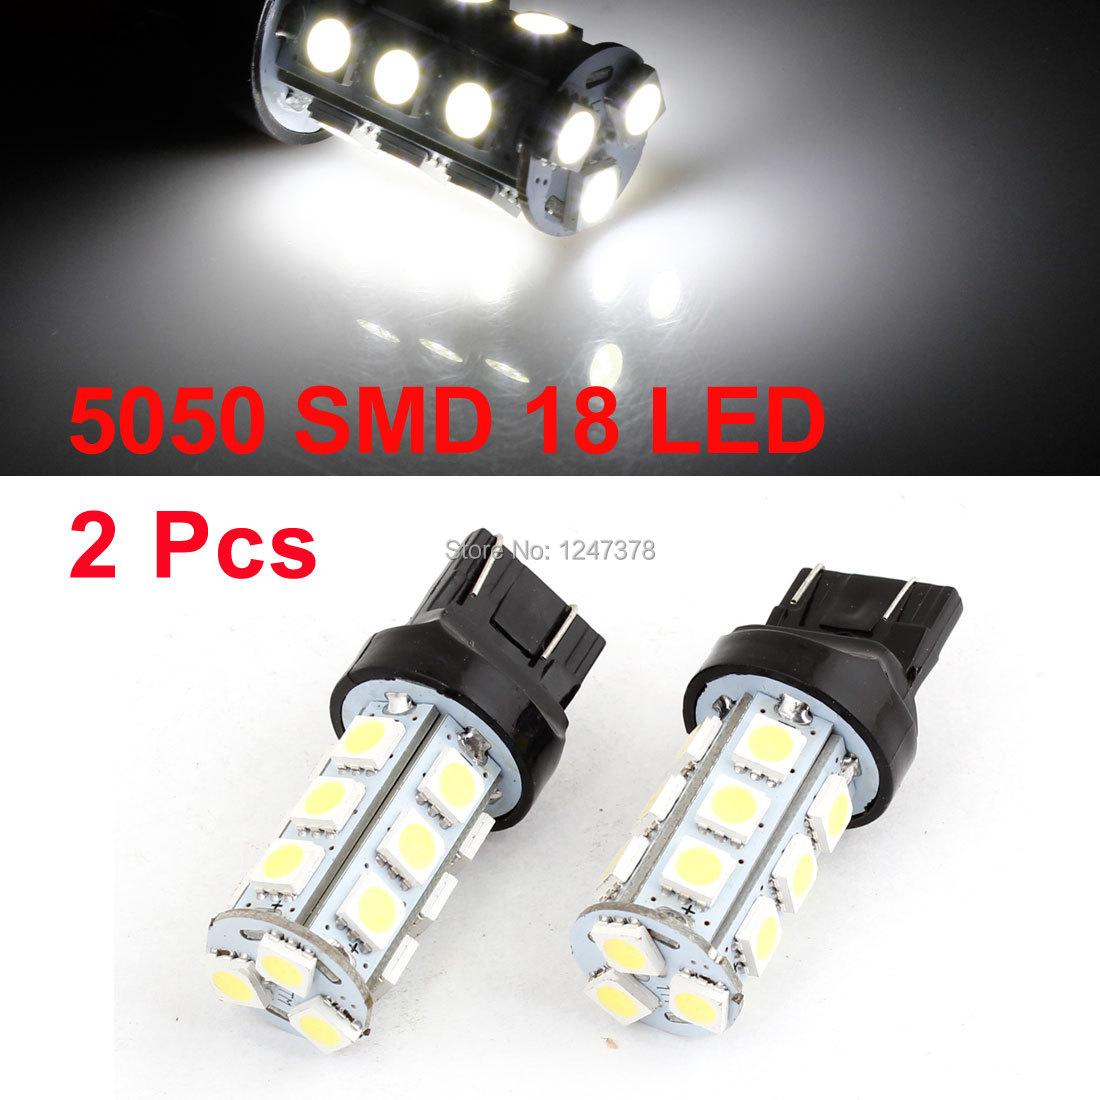 Pair 12V Vehicle Stopping Parking Lamp 7443 5050 SMD 27 LED Light White 12V(China (Mainland))